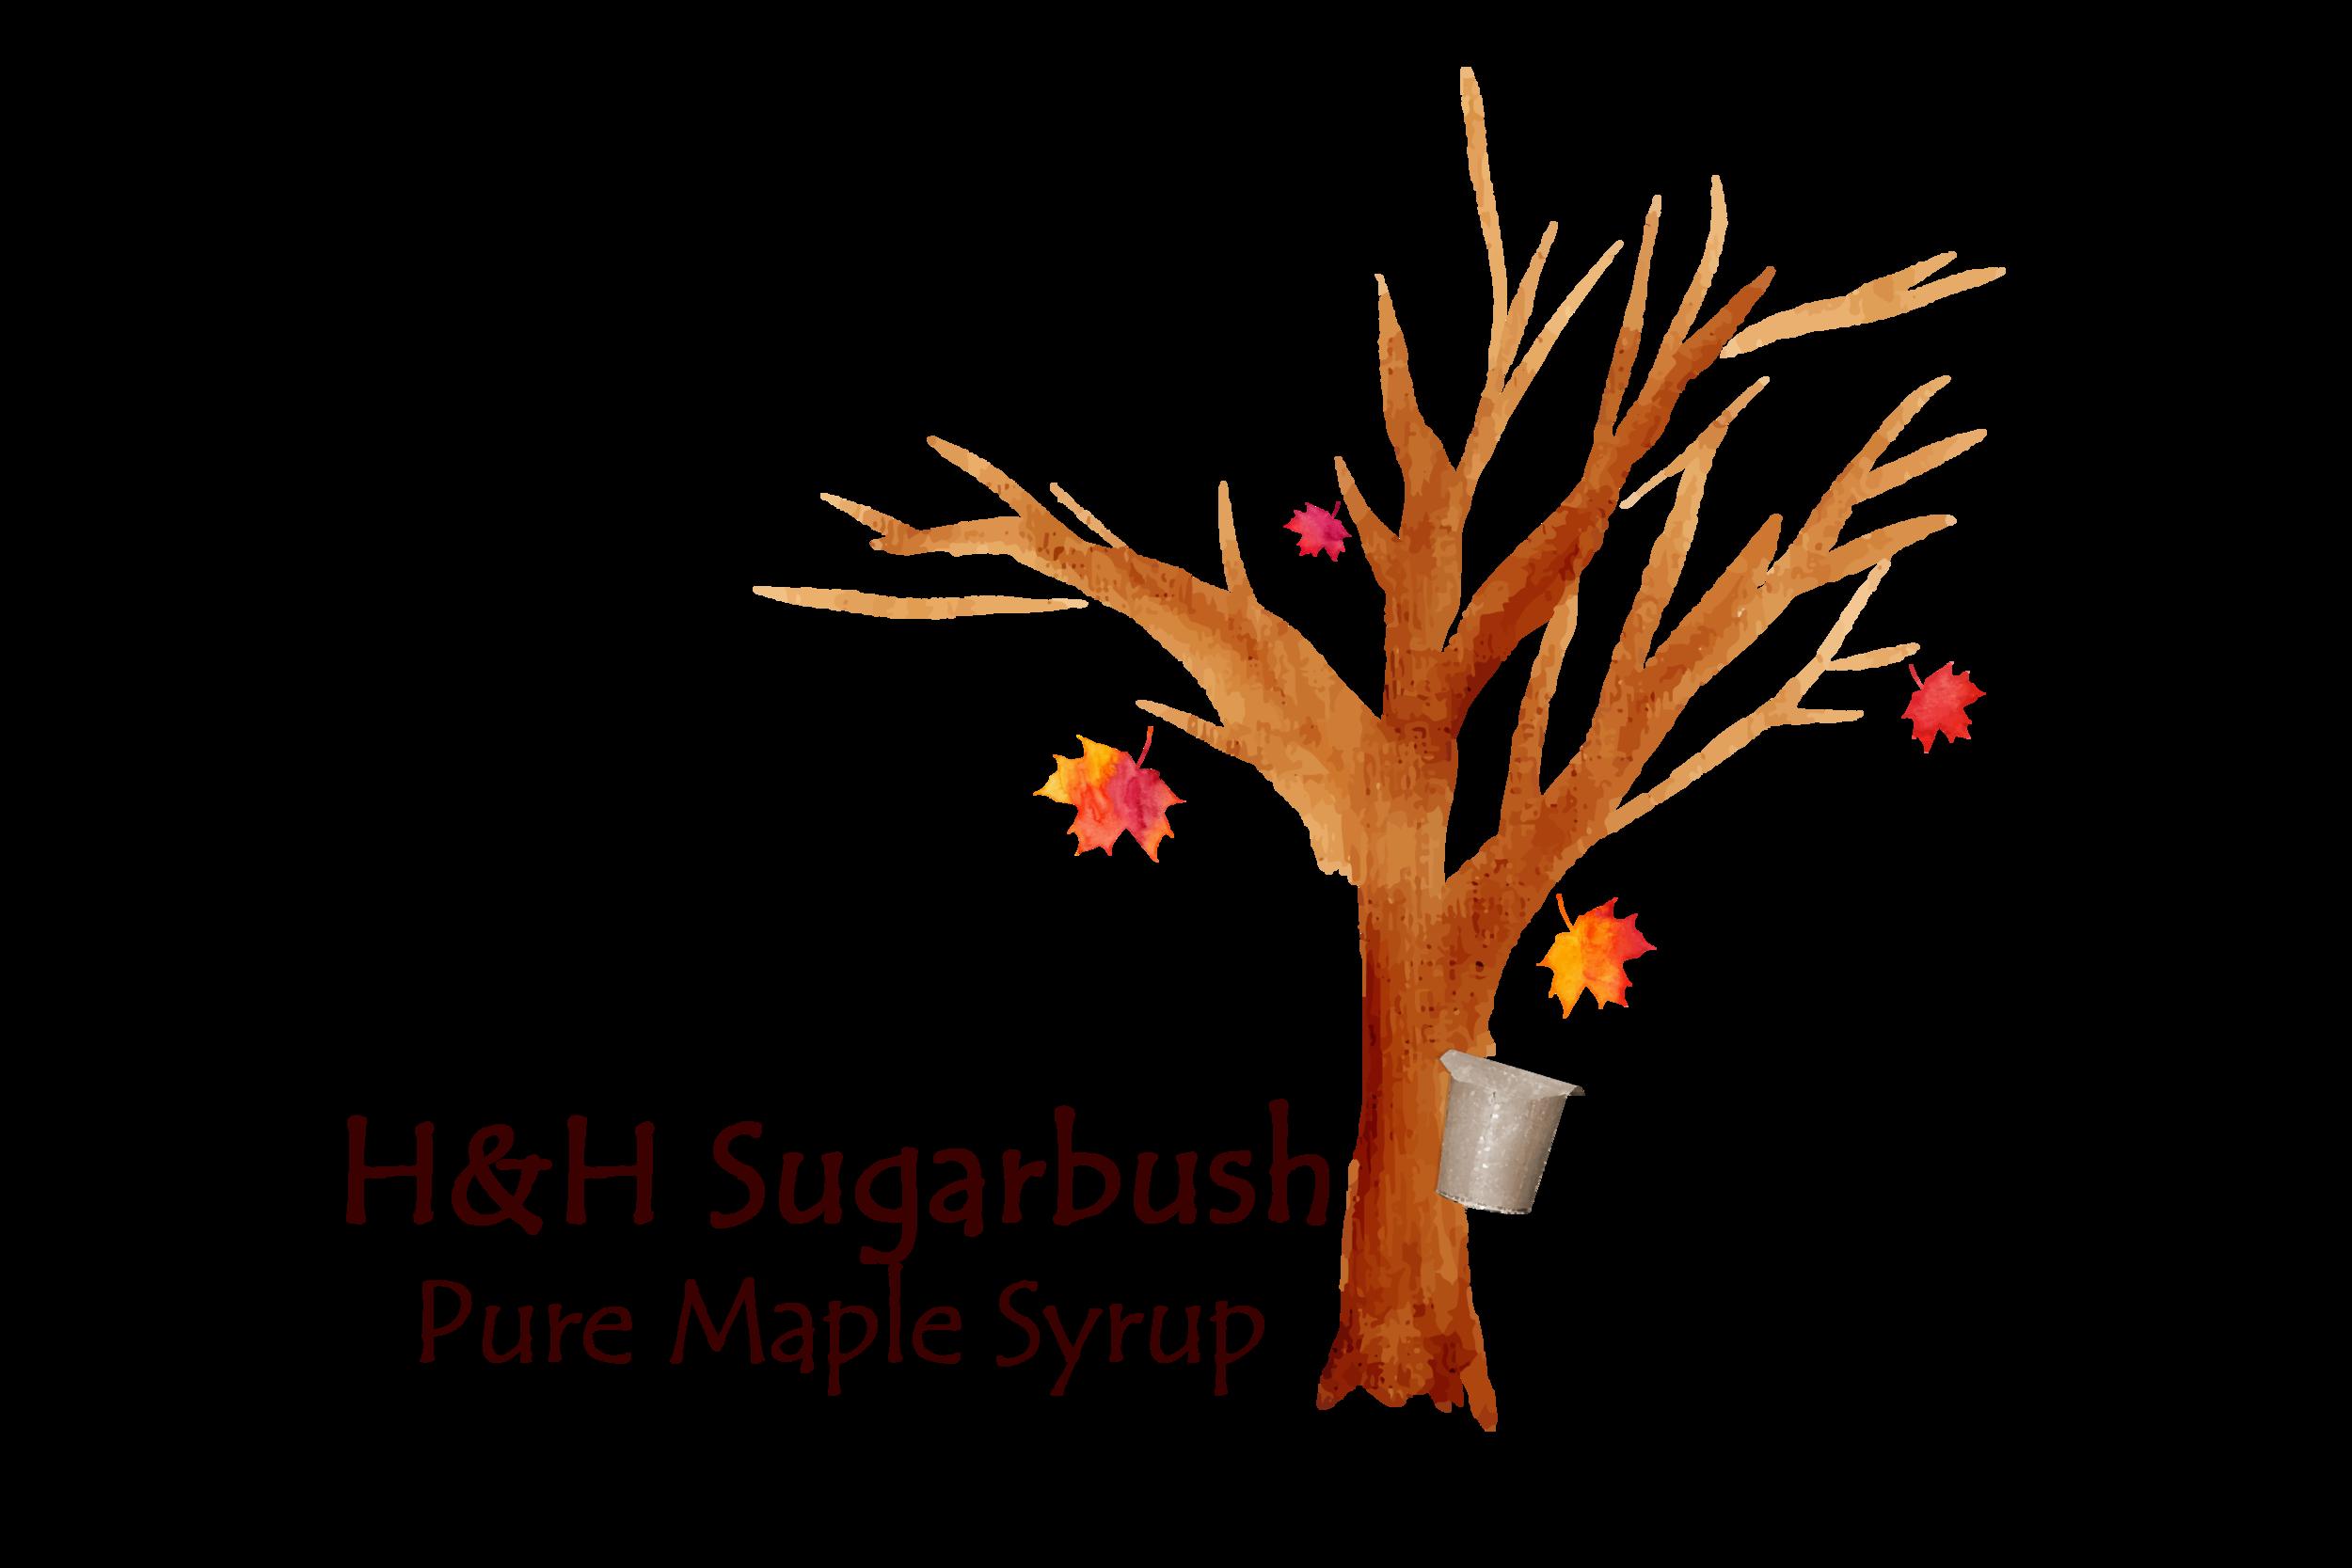 HH_Sugarbush_Color_Logo.png